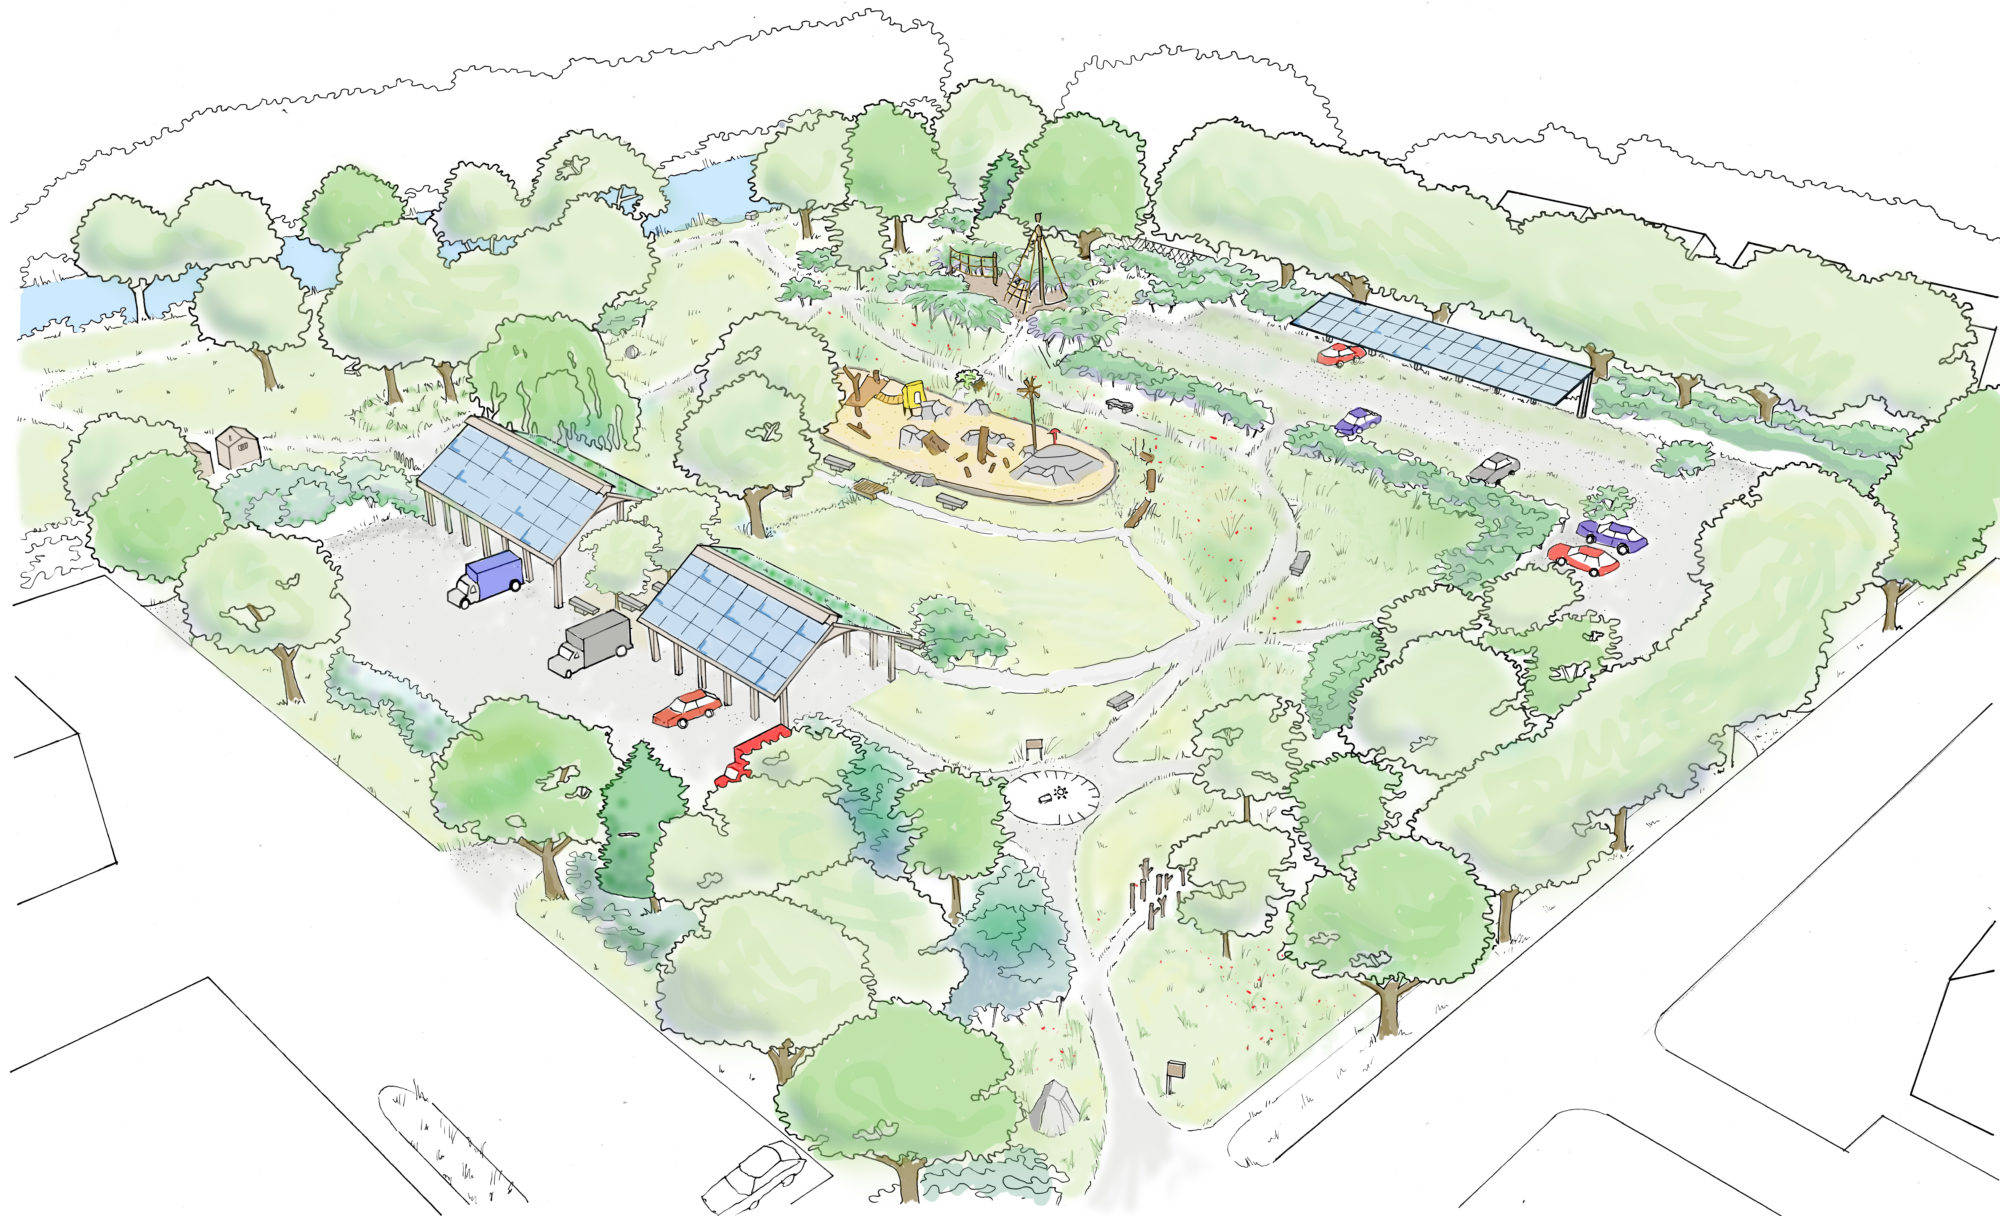 Innovative Park & Playground